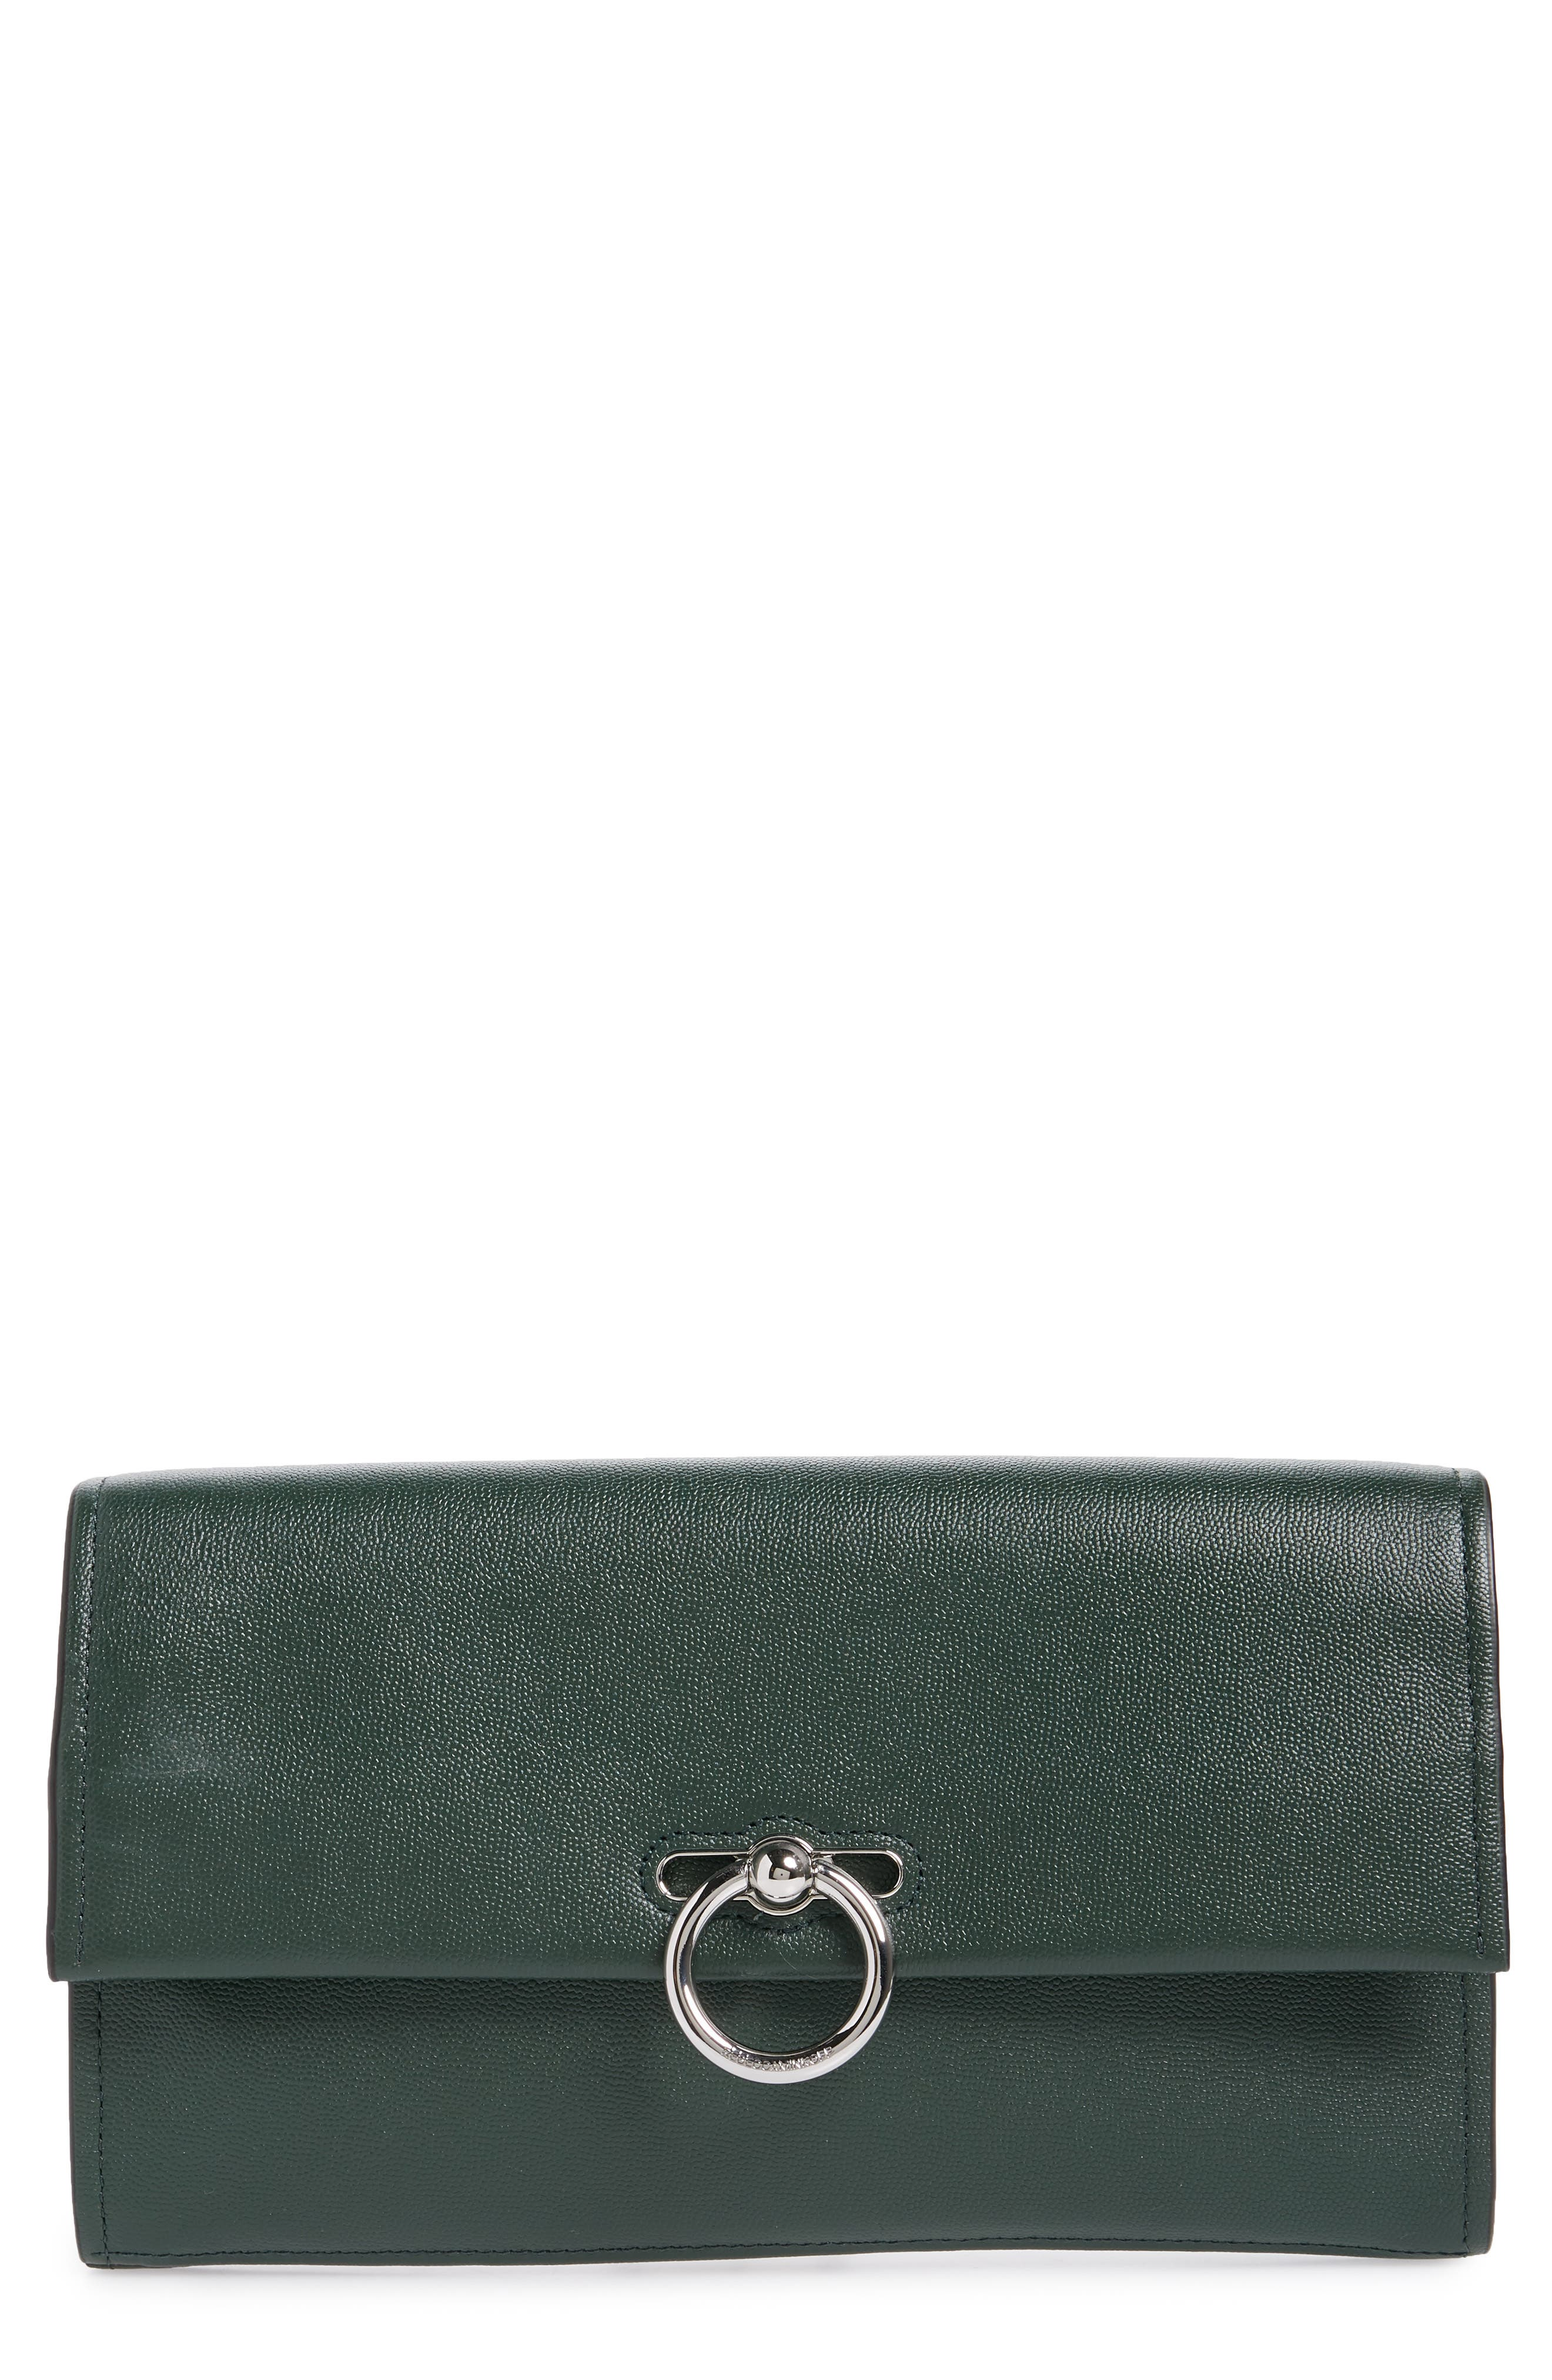 REBECCA MINKOFF Jean Leather Clutch, Main, color, 303